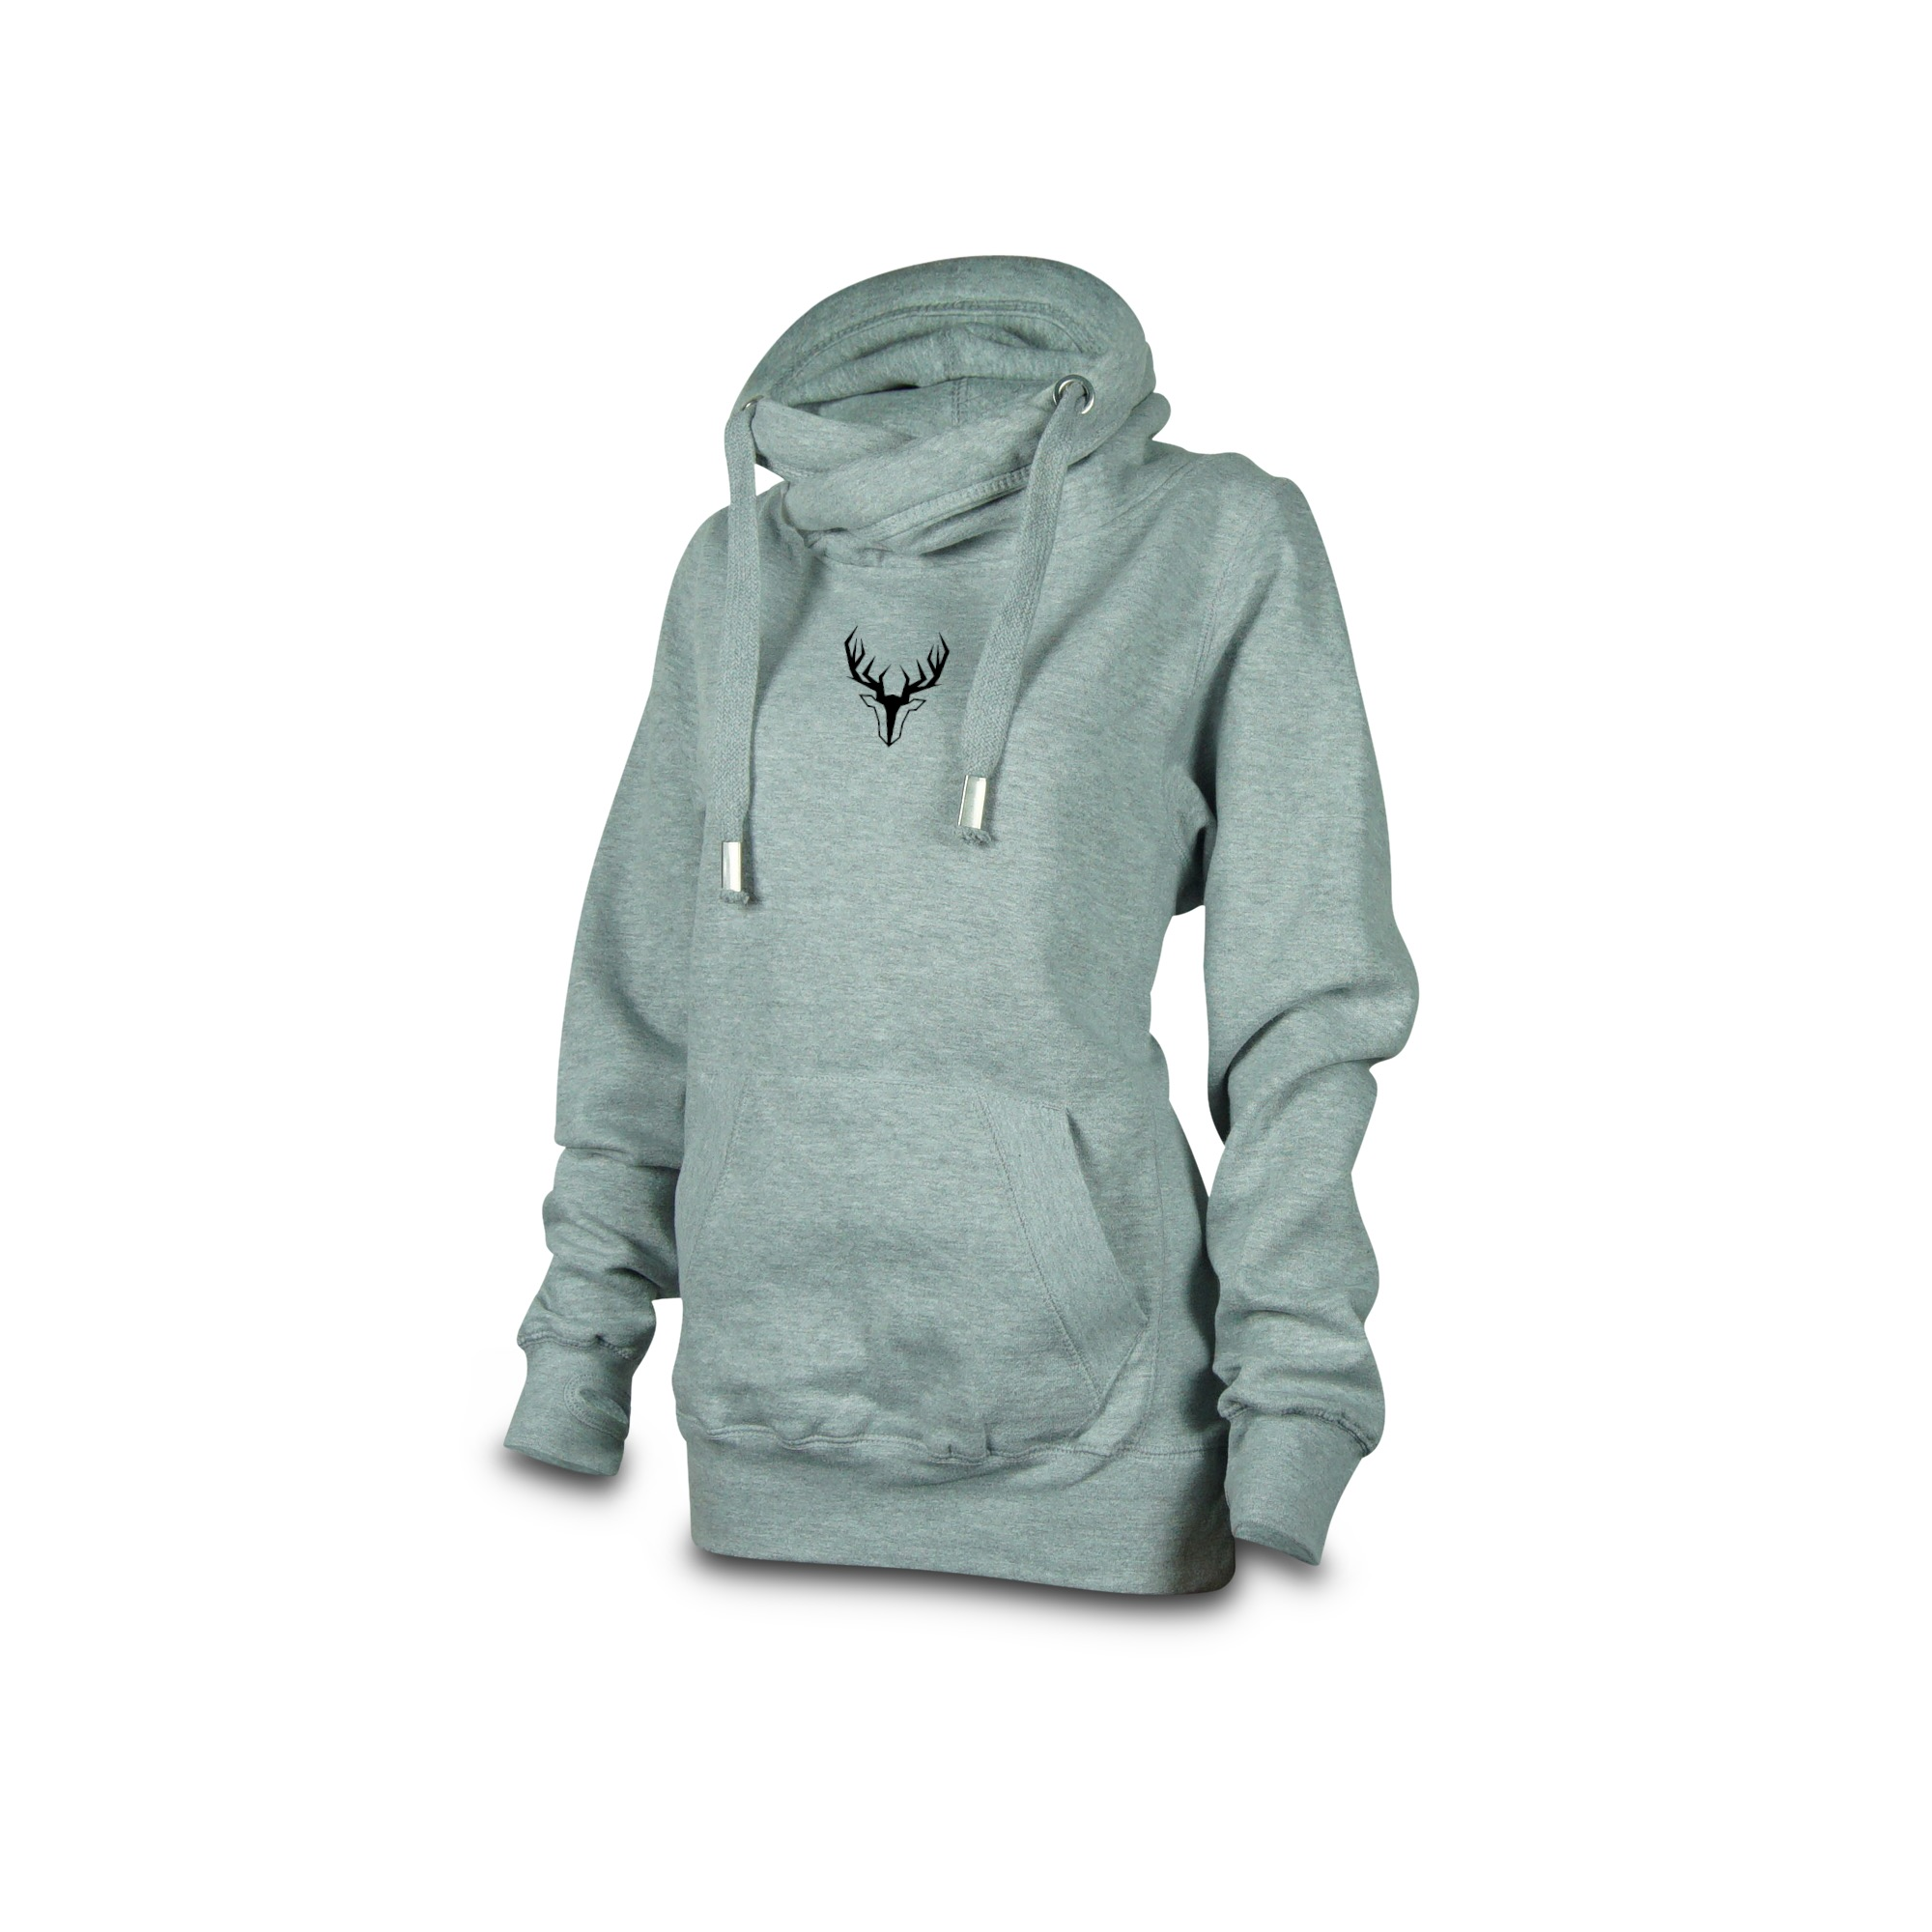 cross_neck_hoodie_damen_grau_hirsch_klein